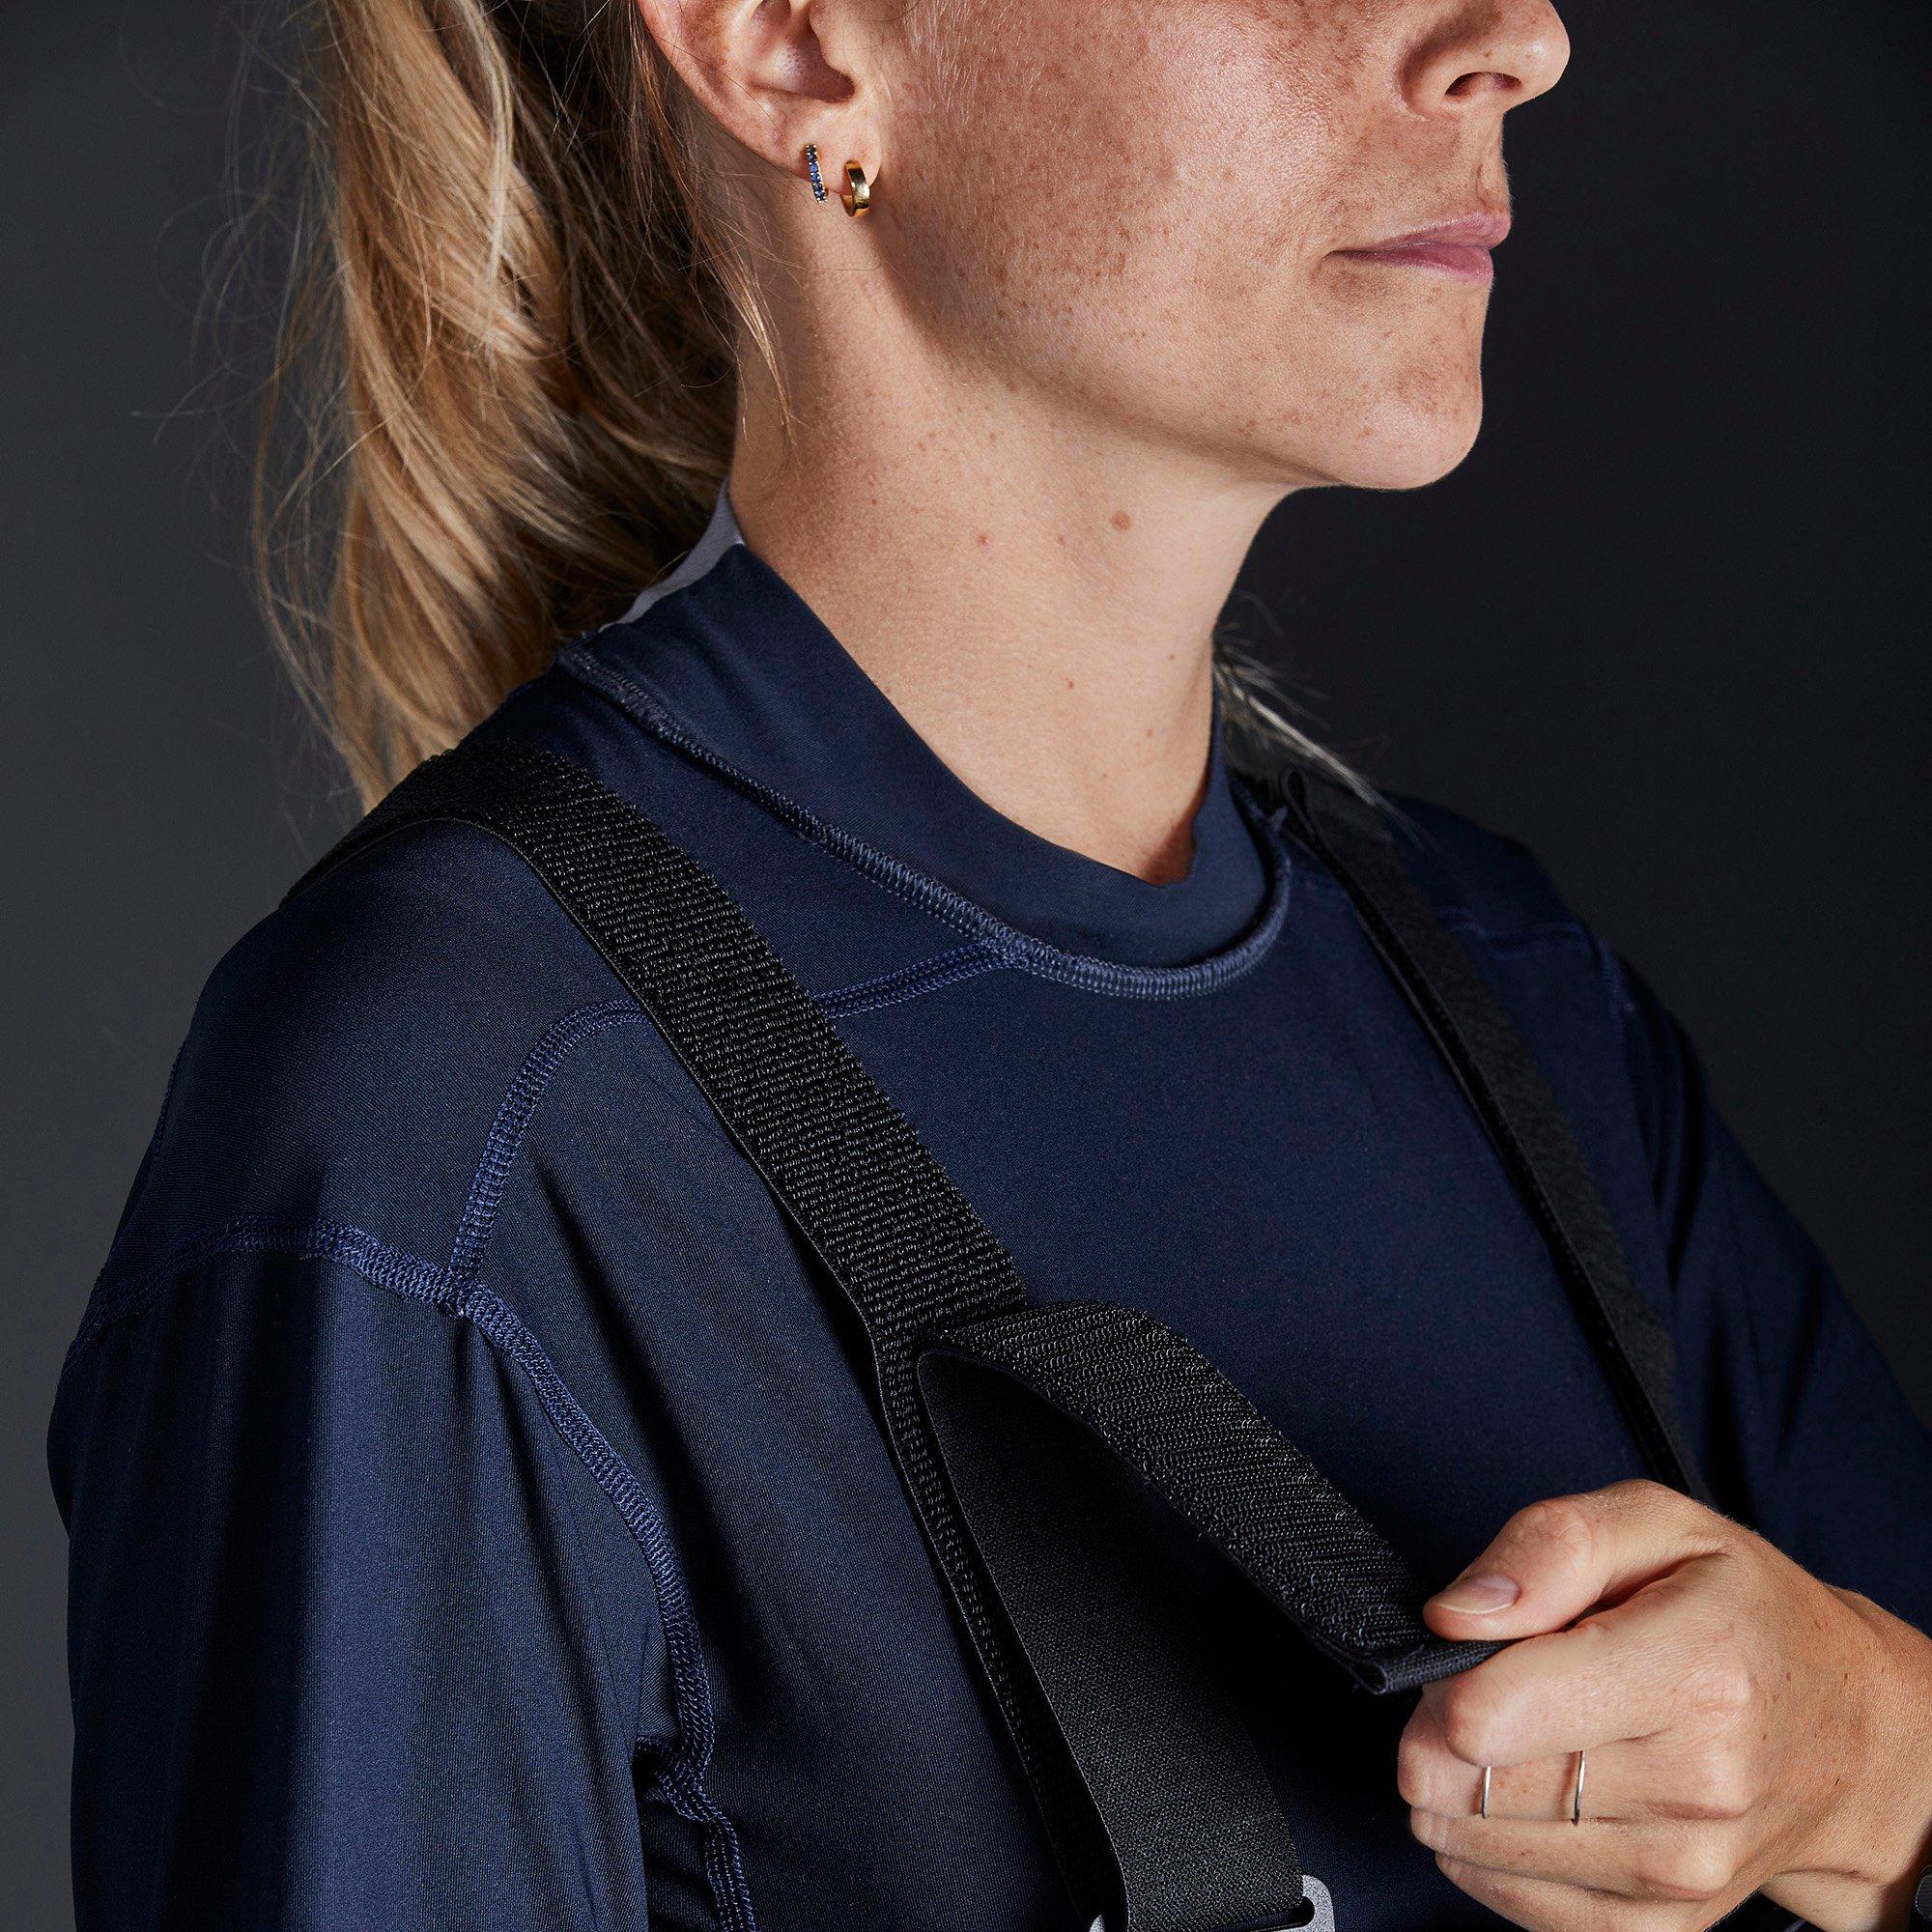 Women's OS3 Coastal Trousers - OS32TW-GRA01-MODEL_4.jpg